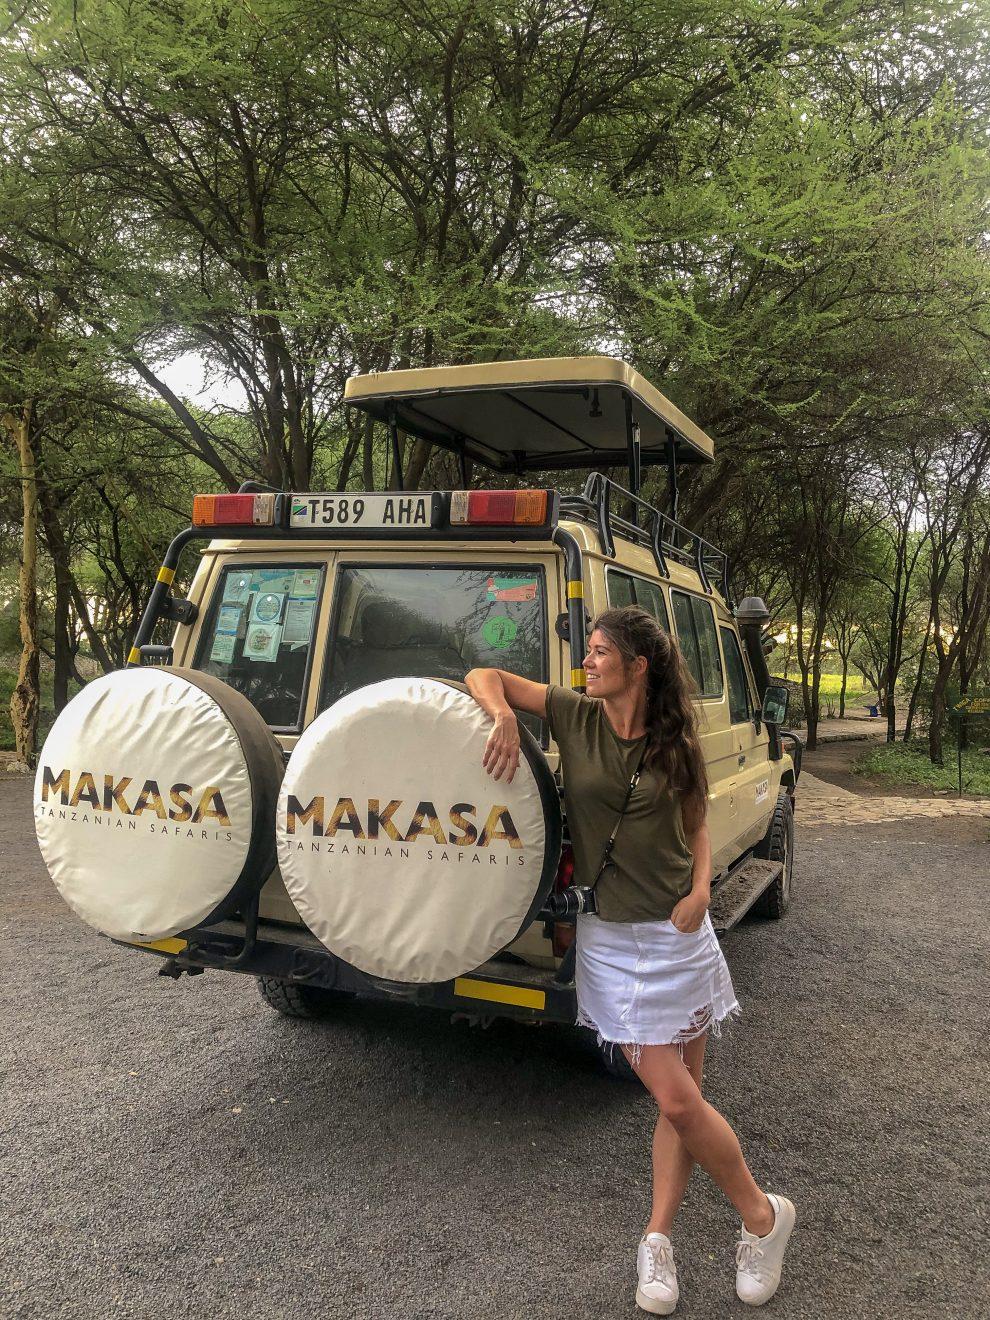 Fotograferen op safari. Dit zijn de beste tips! Safari in Tarangire National Park Tanzania Makasa safaris